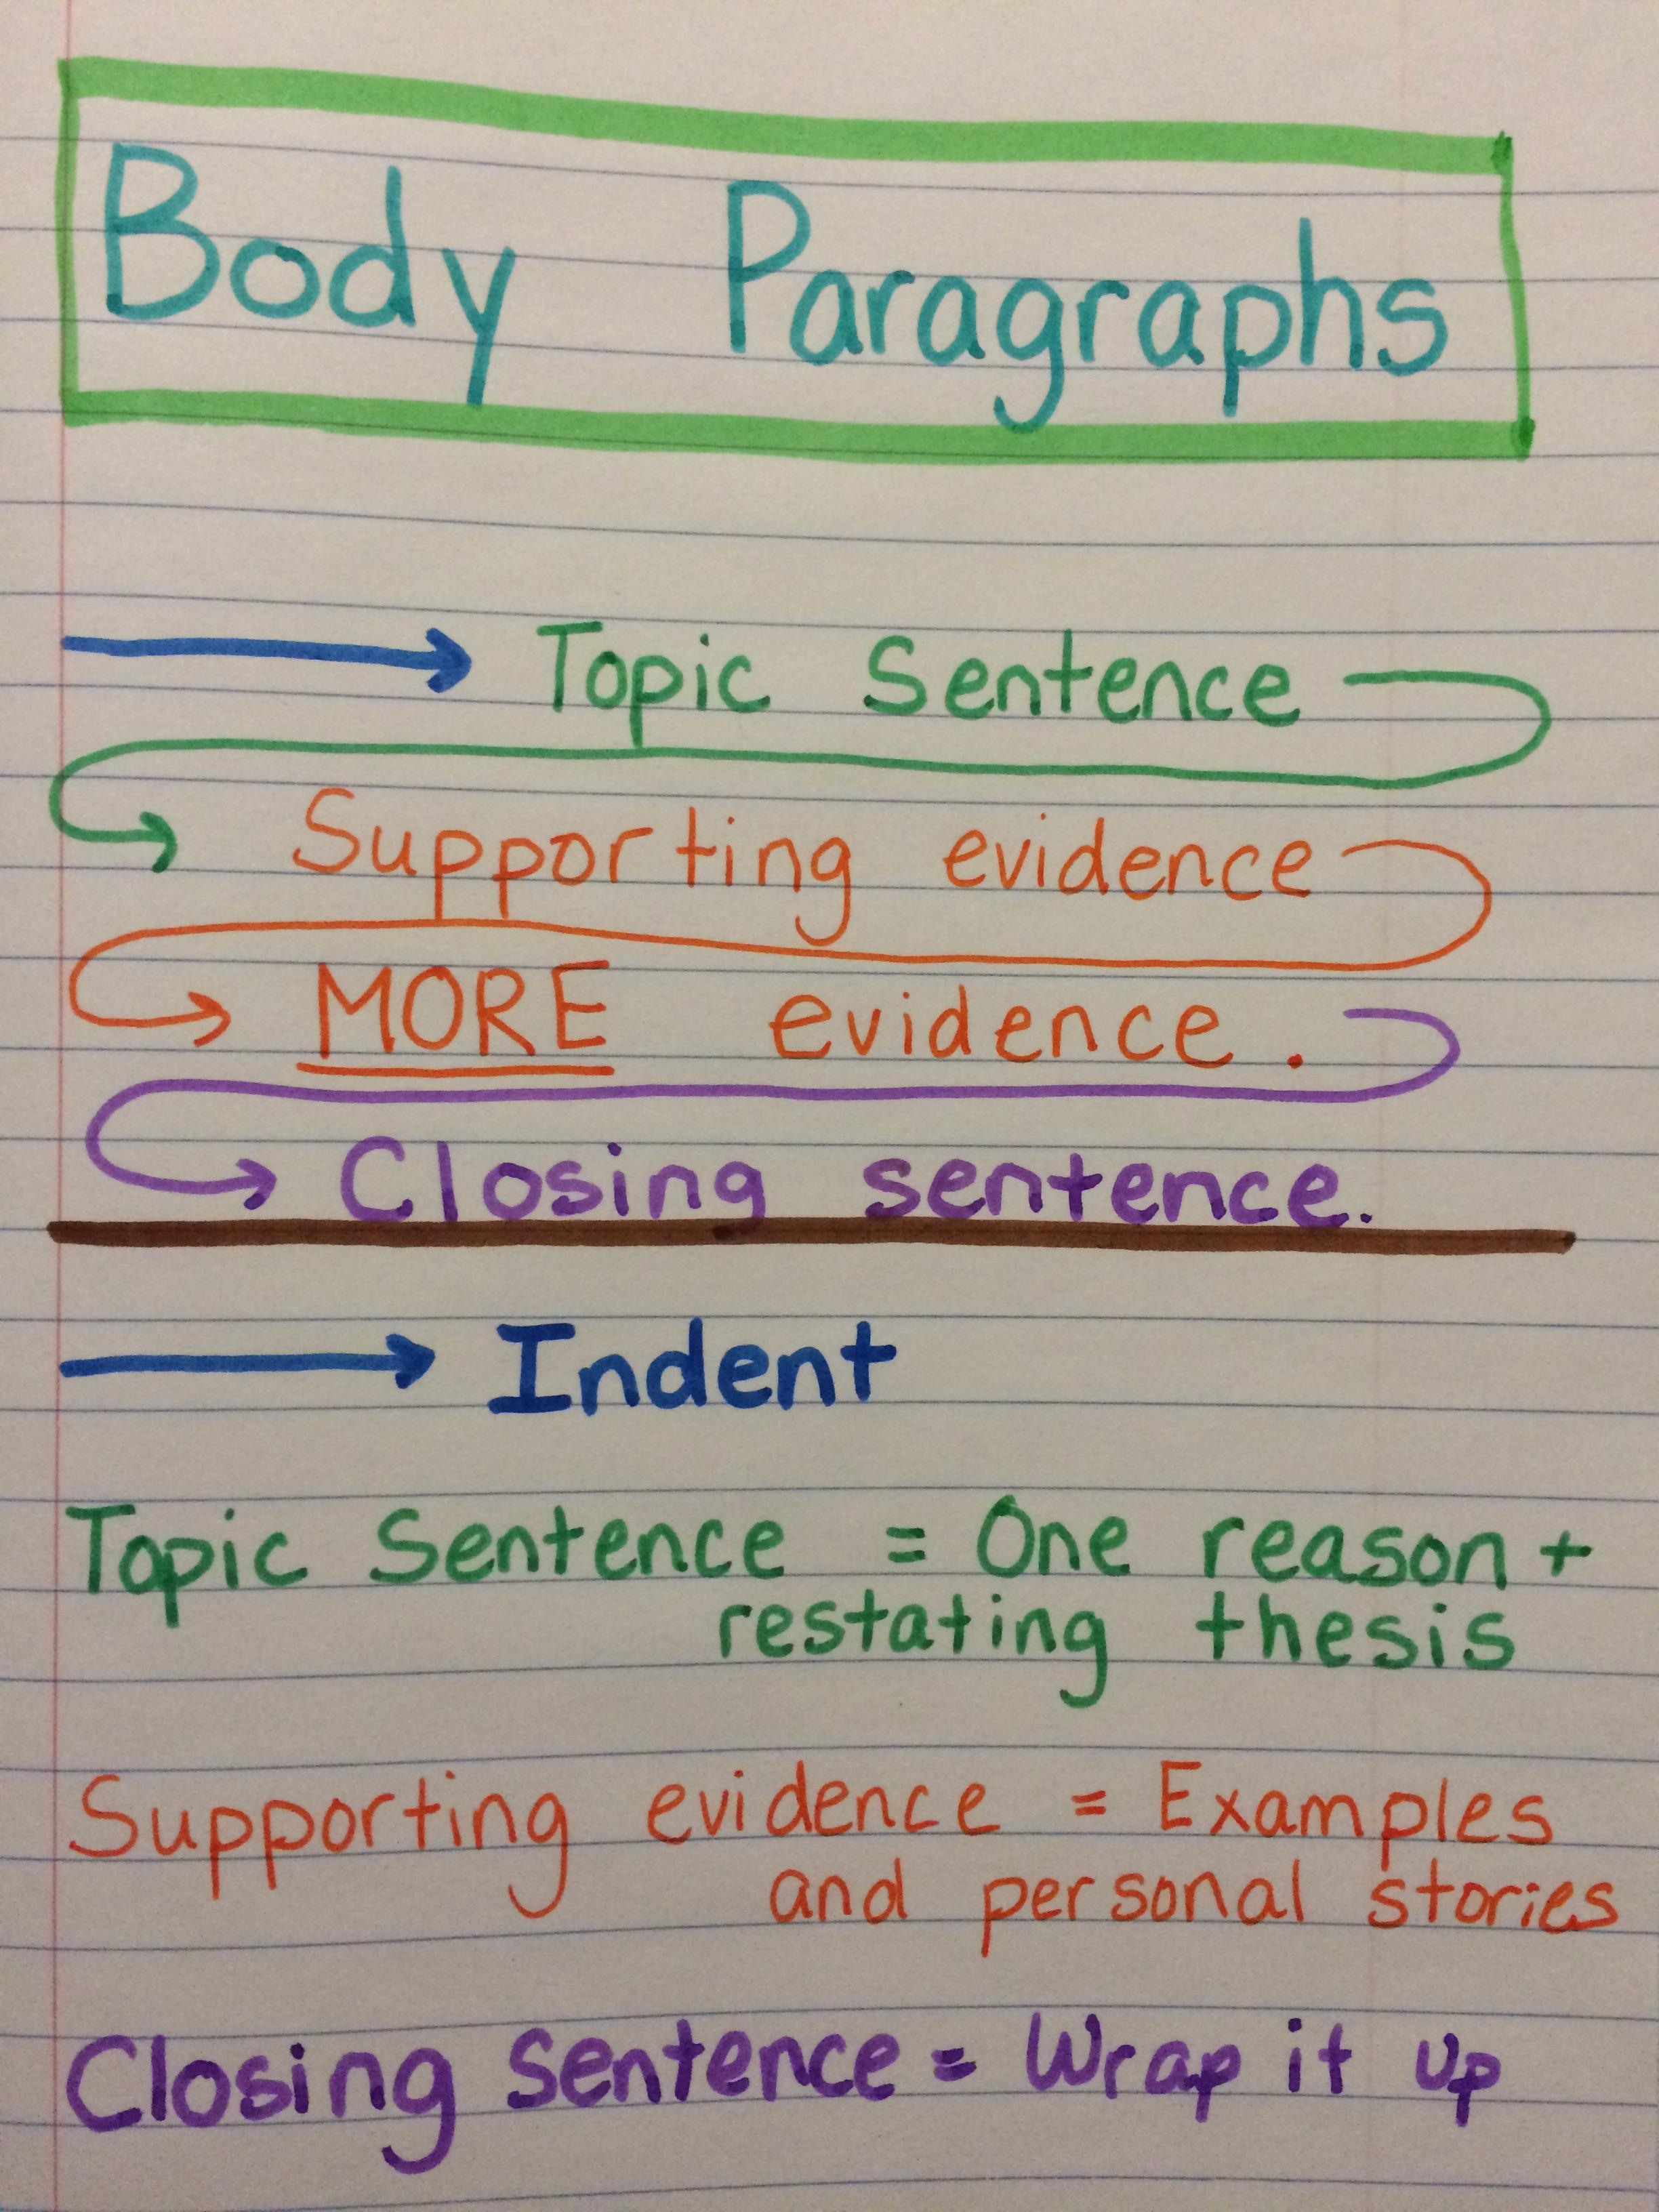 Personal Essay Body Paragraphs